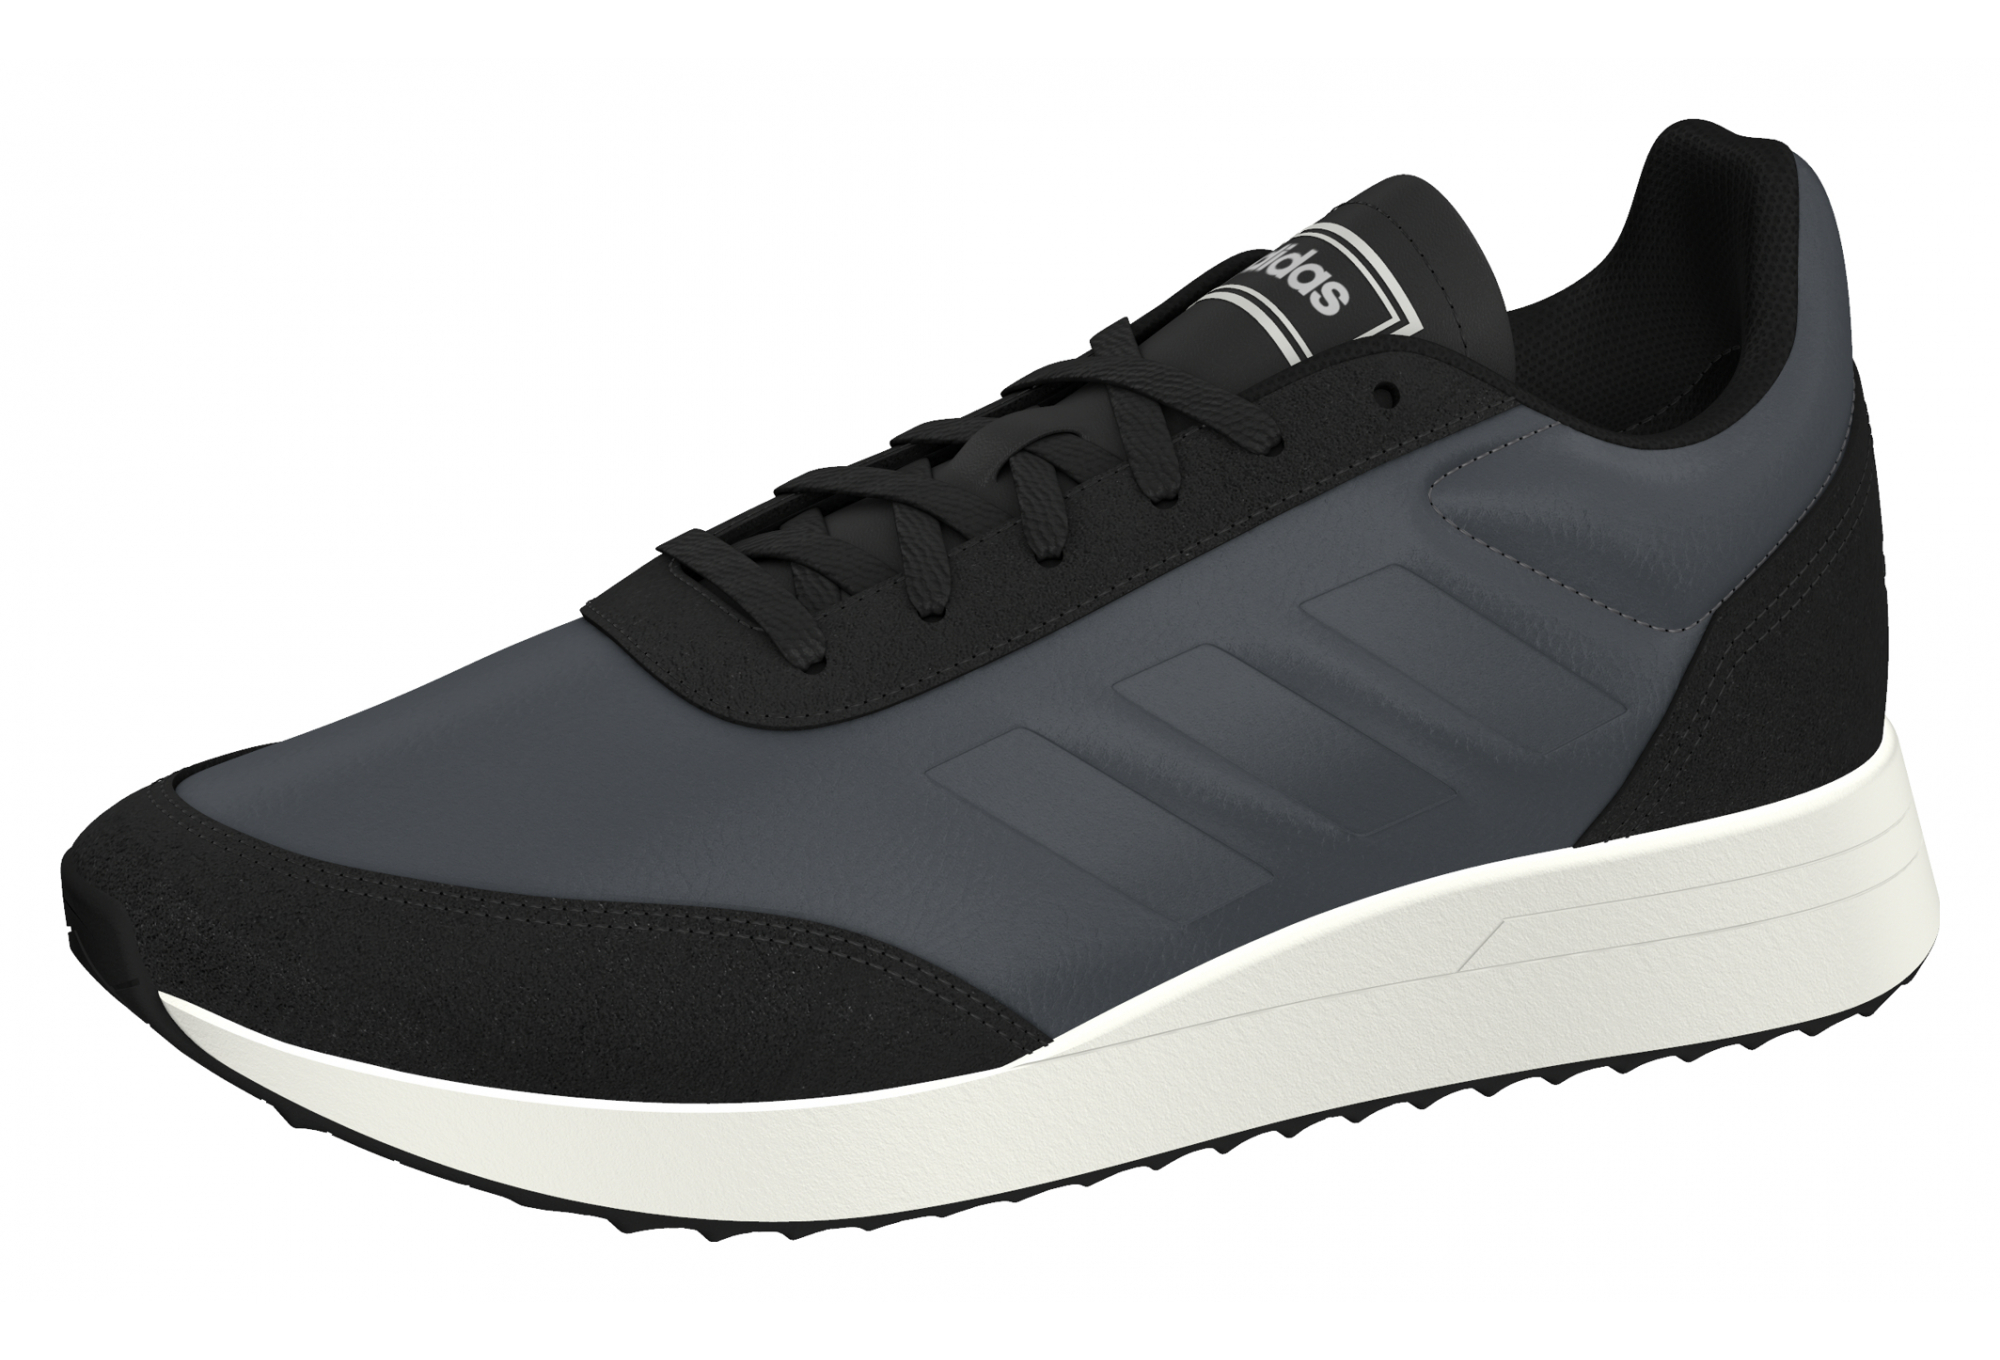 Arábica Tentación Acelerar  Chaussures femme adidas Run 70s   Alltricks.com